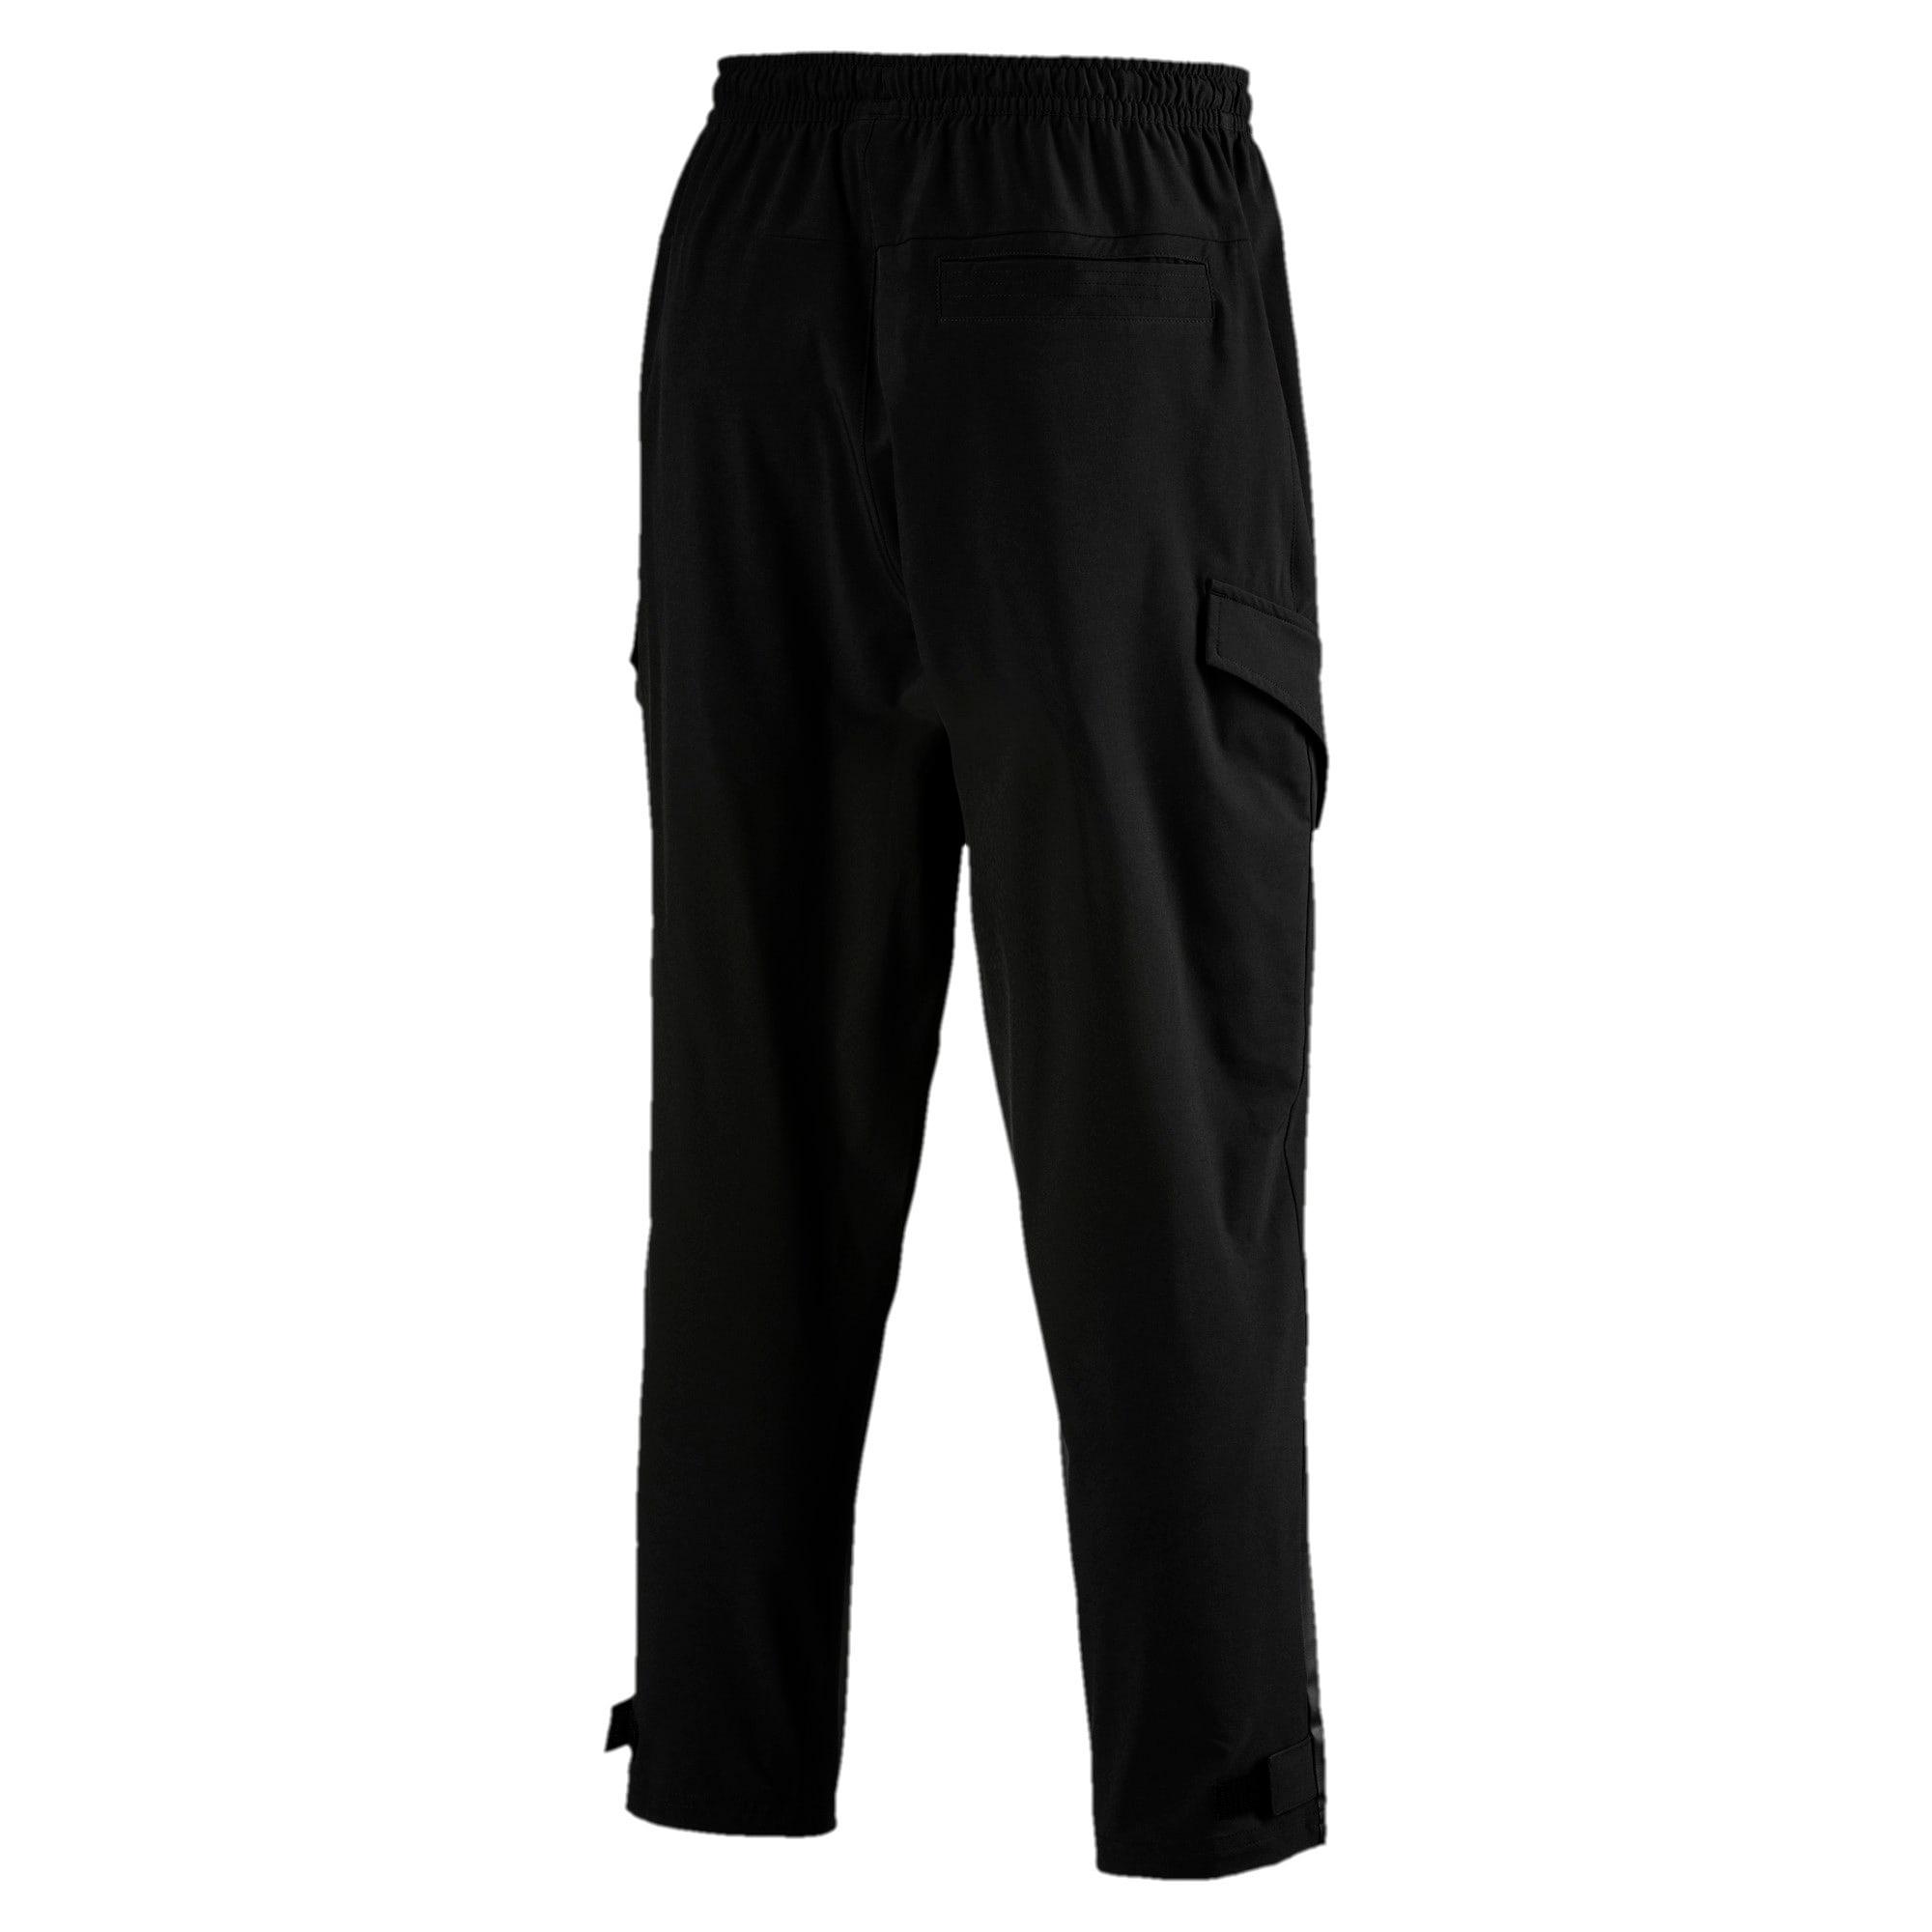 Thumbnail 4 of Pace Men's Sweatpants, Puma Black-1, medium-IND